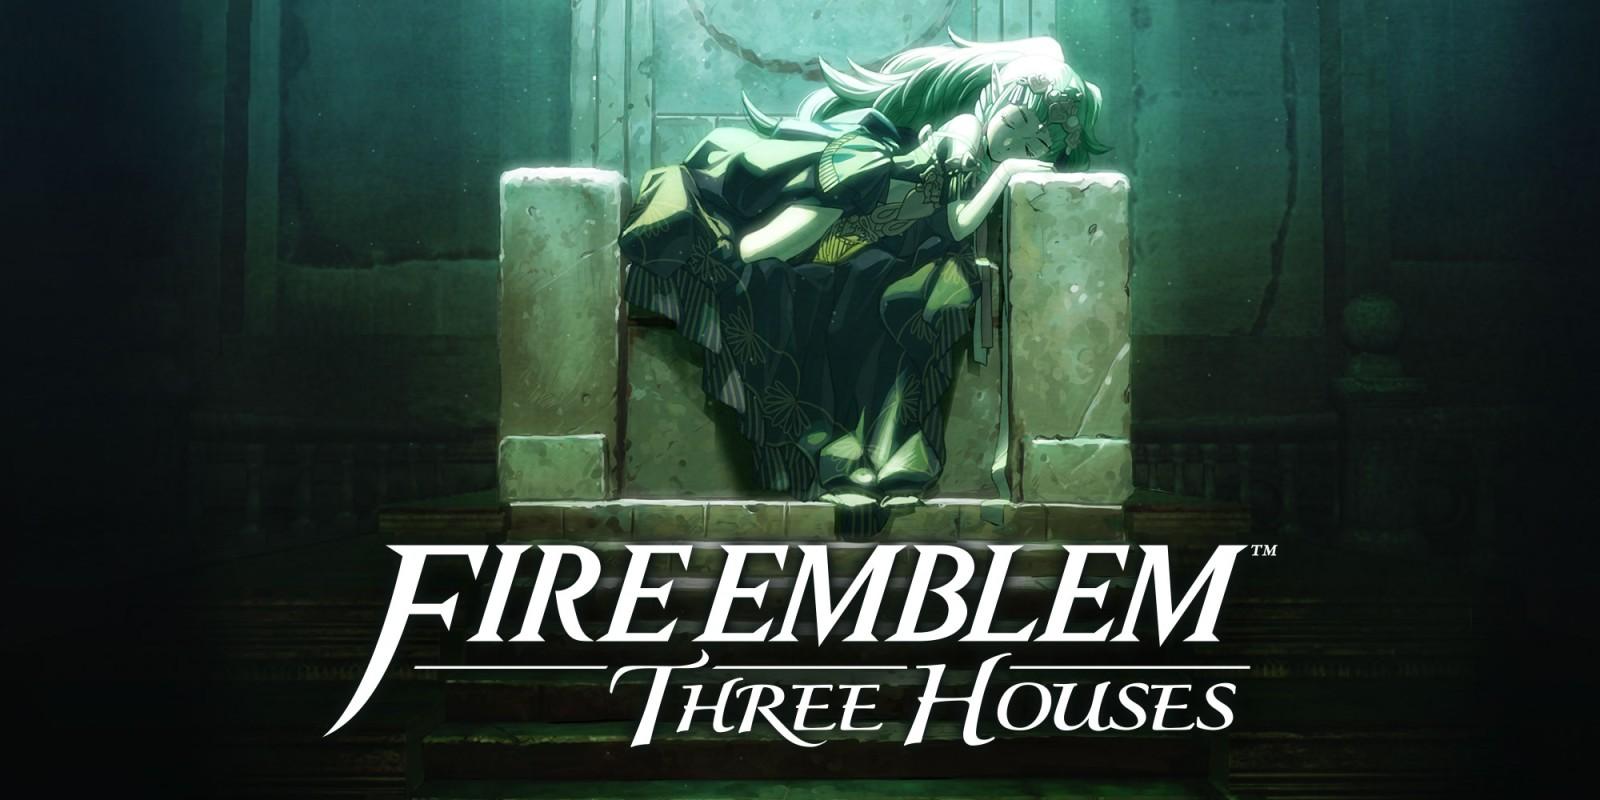 Fire Emblem Three Houses looks like it takes place at Hogwarts